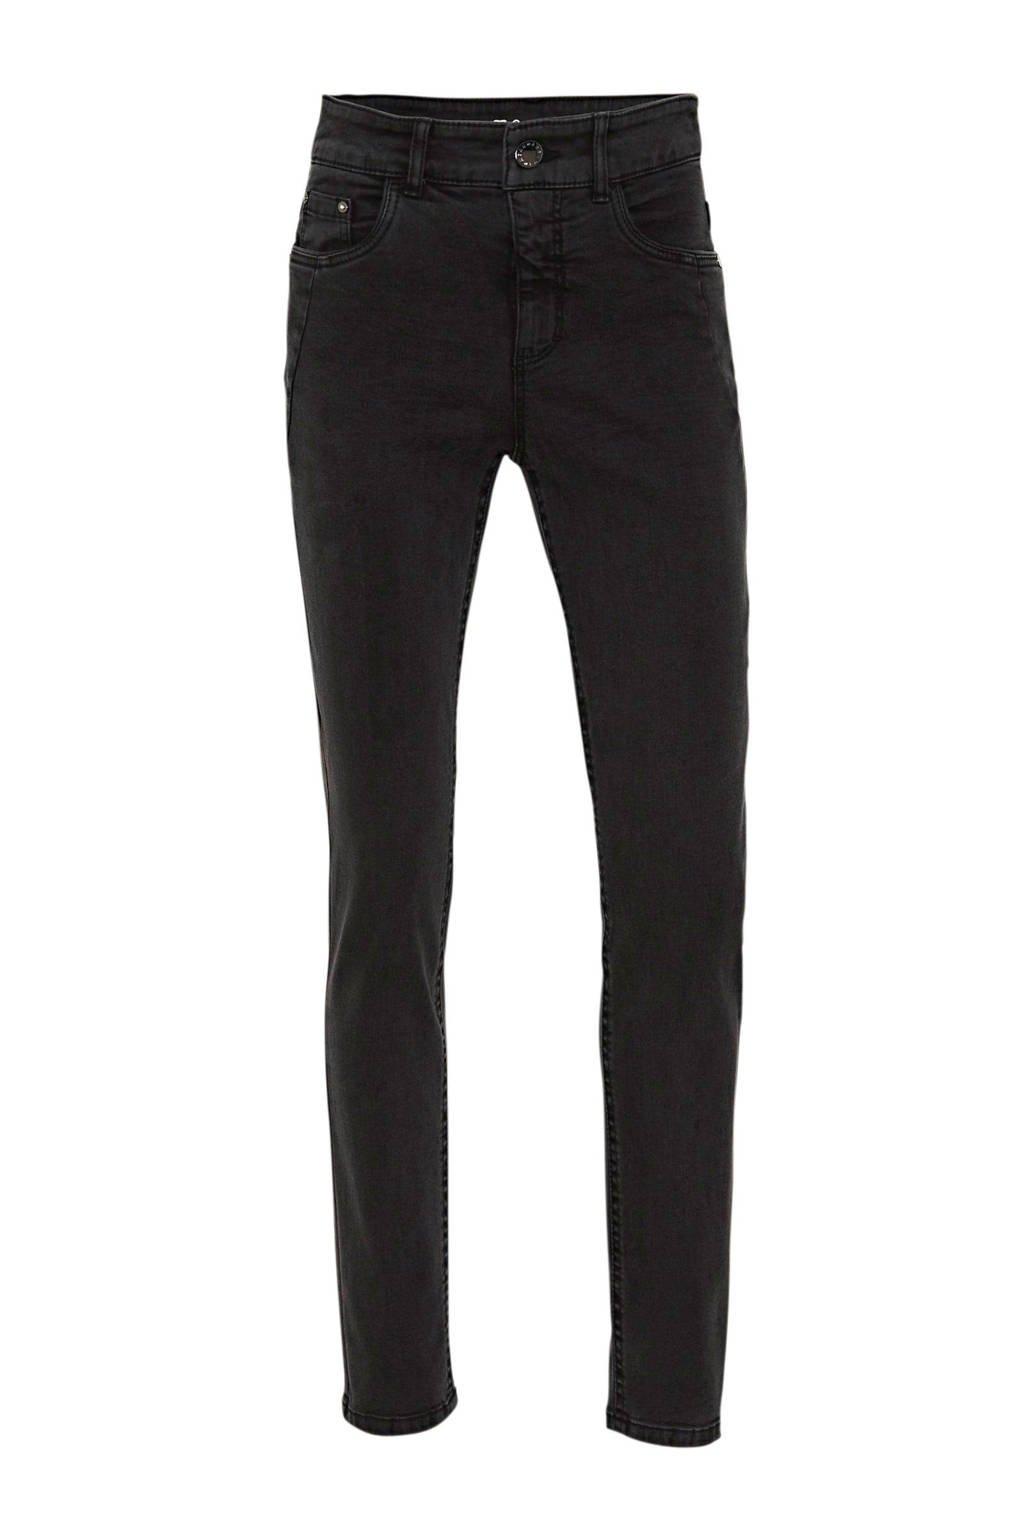 C&A skinny jeans antraciet, Antraciet